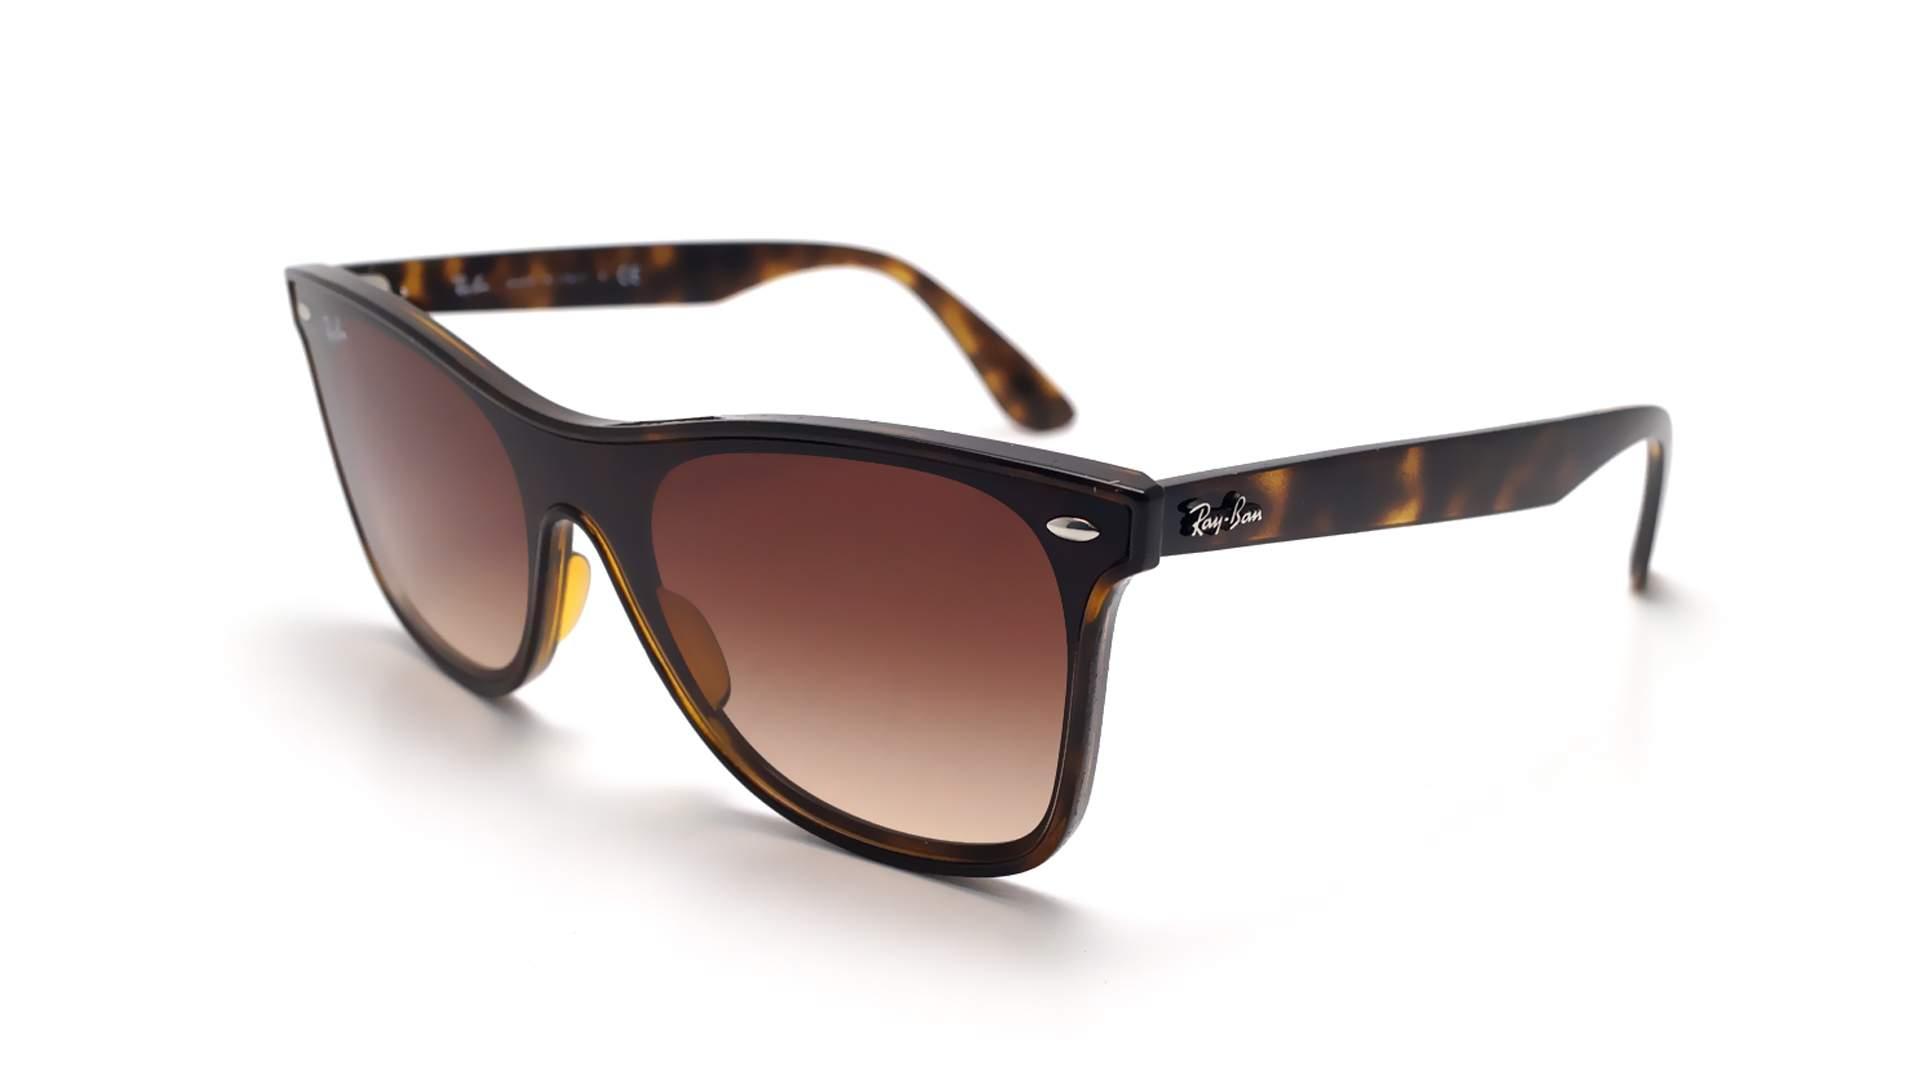 e29bfb2bb5c731 Sunglasses Ray-Ban Wayfarer Blaze Brown RB4440N 710/13 41-18 Medium Gradient